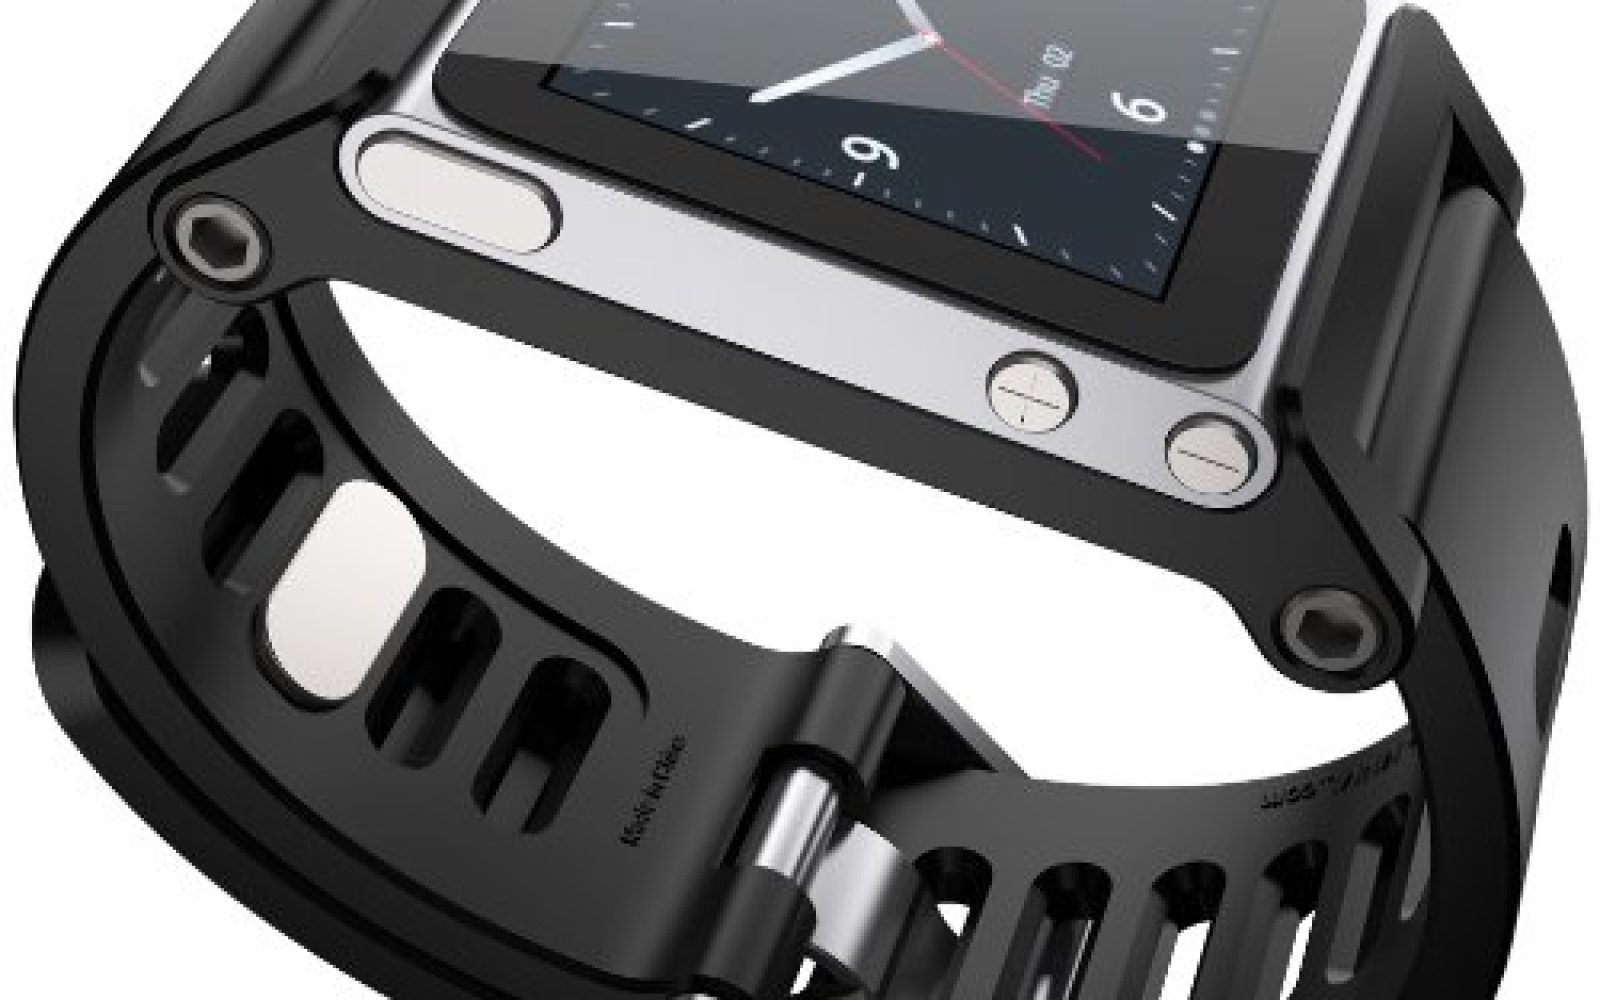 LunaTik TikTok Watch Wrist Strap for iPod Nano 6G in 5 colors: Starting at $5 shipped